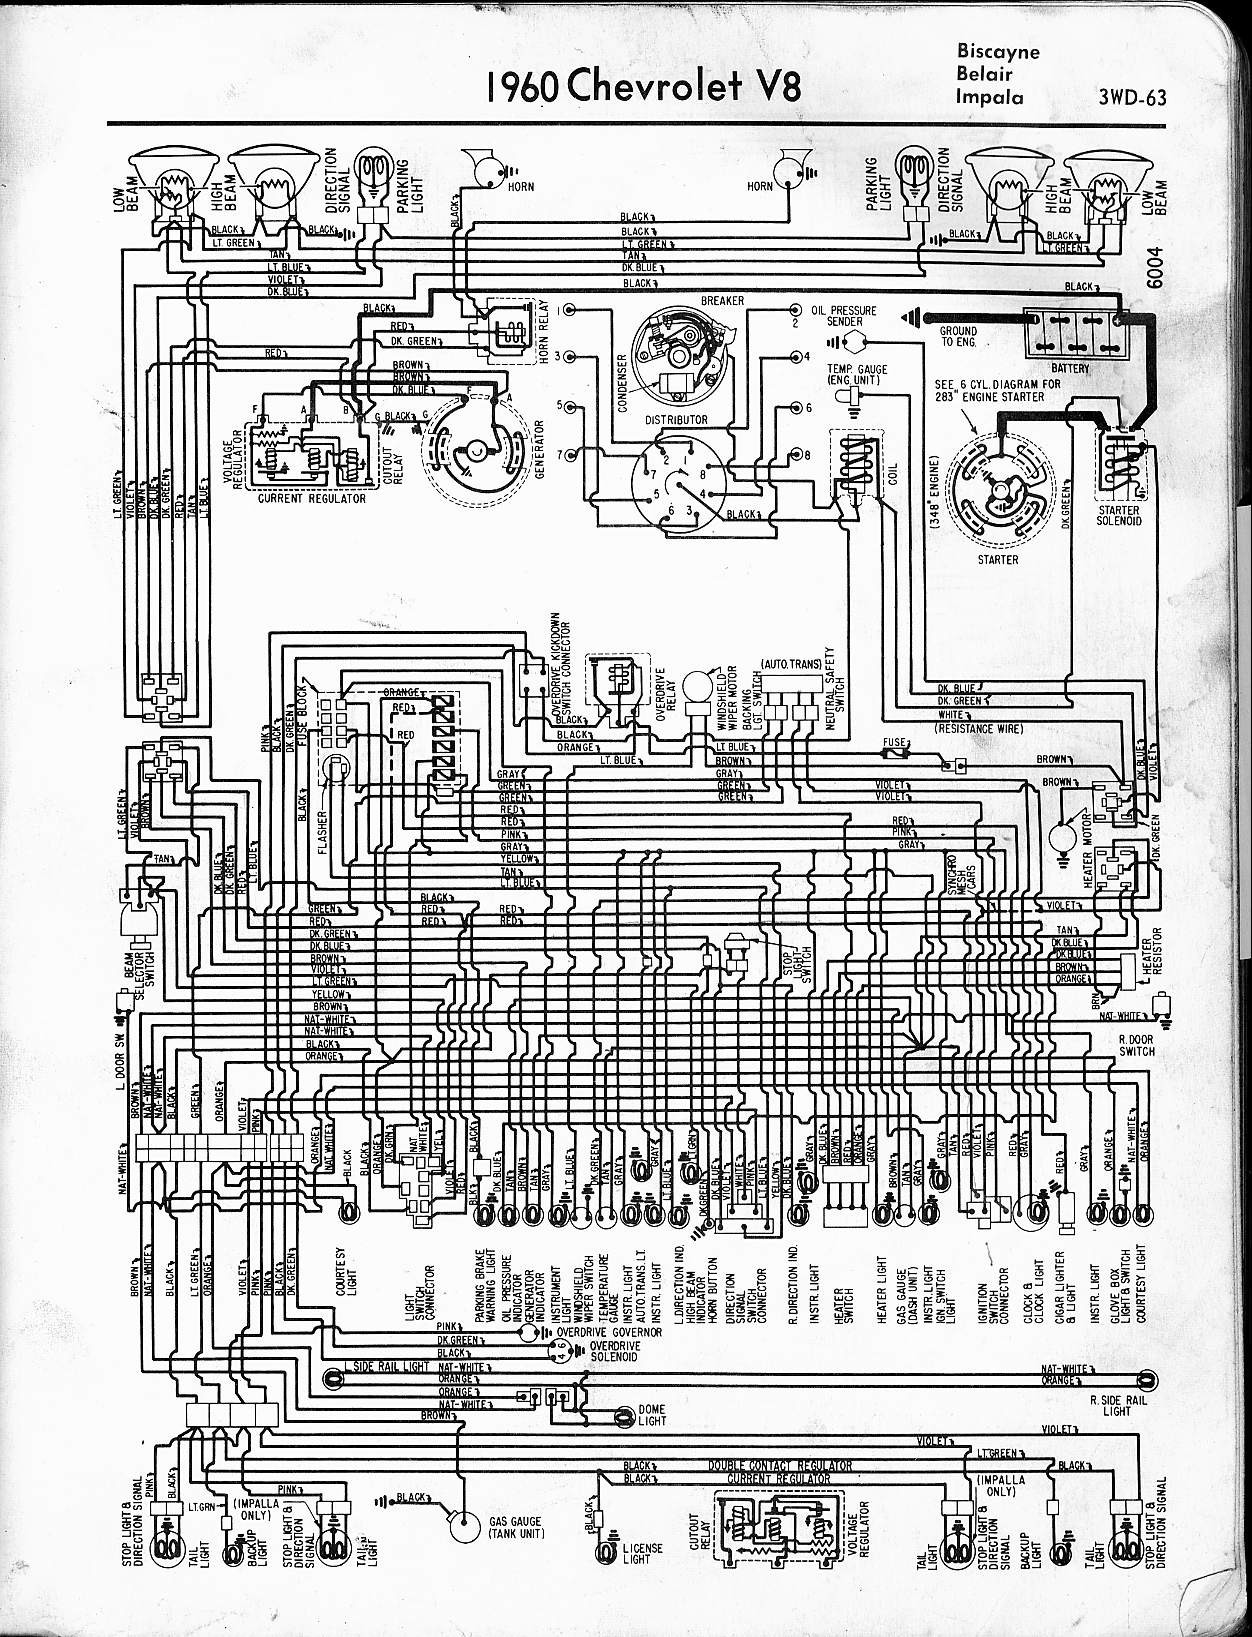 1985 Chevy Truck Steering Column Diagram Chevy Tilt Steering Column Wiring  Diagram Perfect Chevy Truck Of